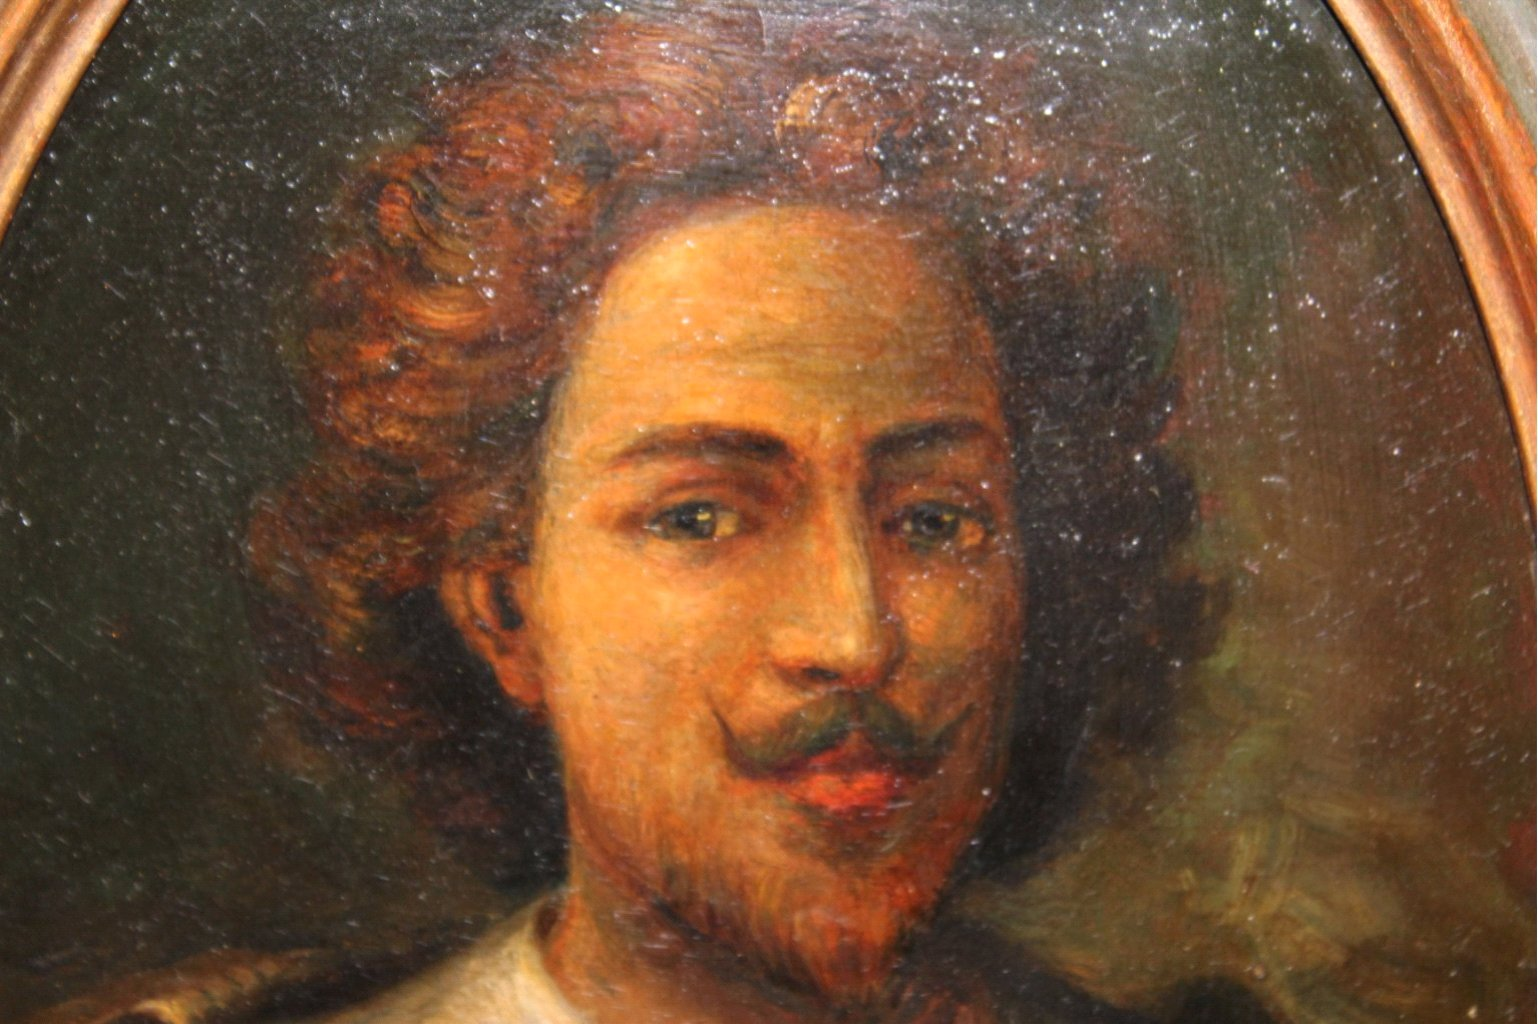 Portrait des 18. Jahrhundert-1